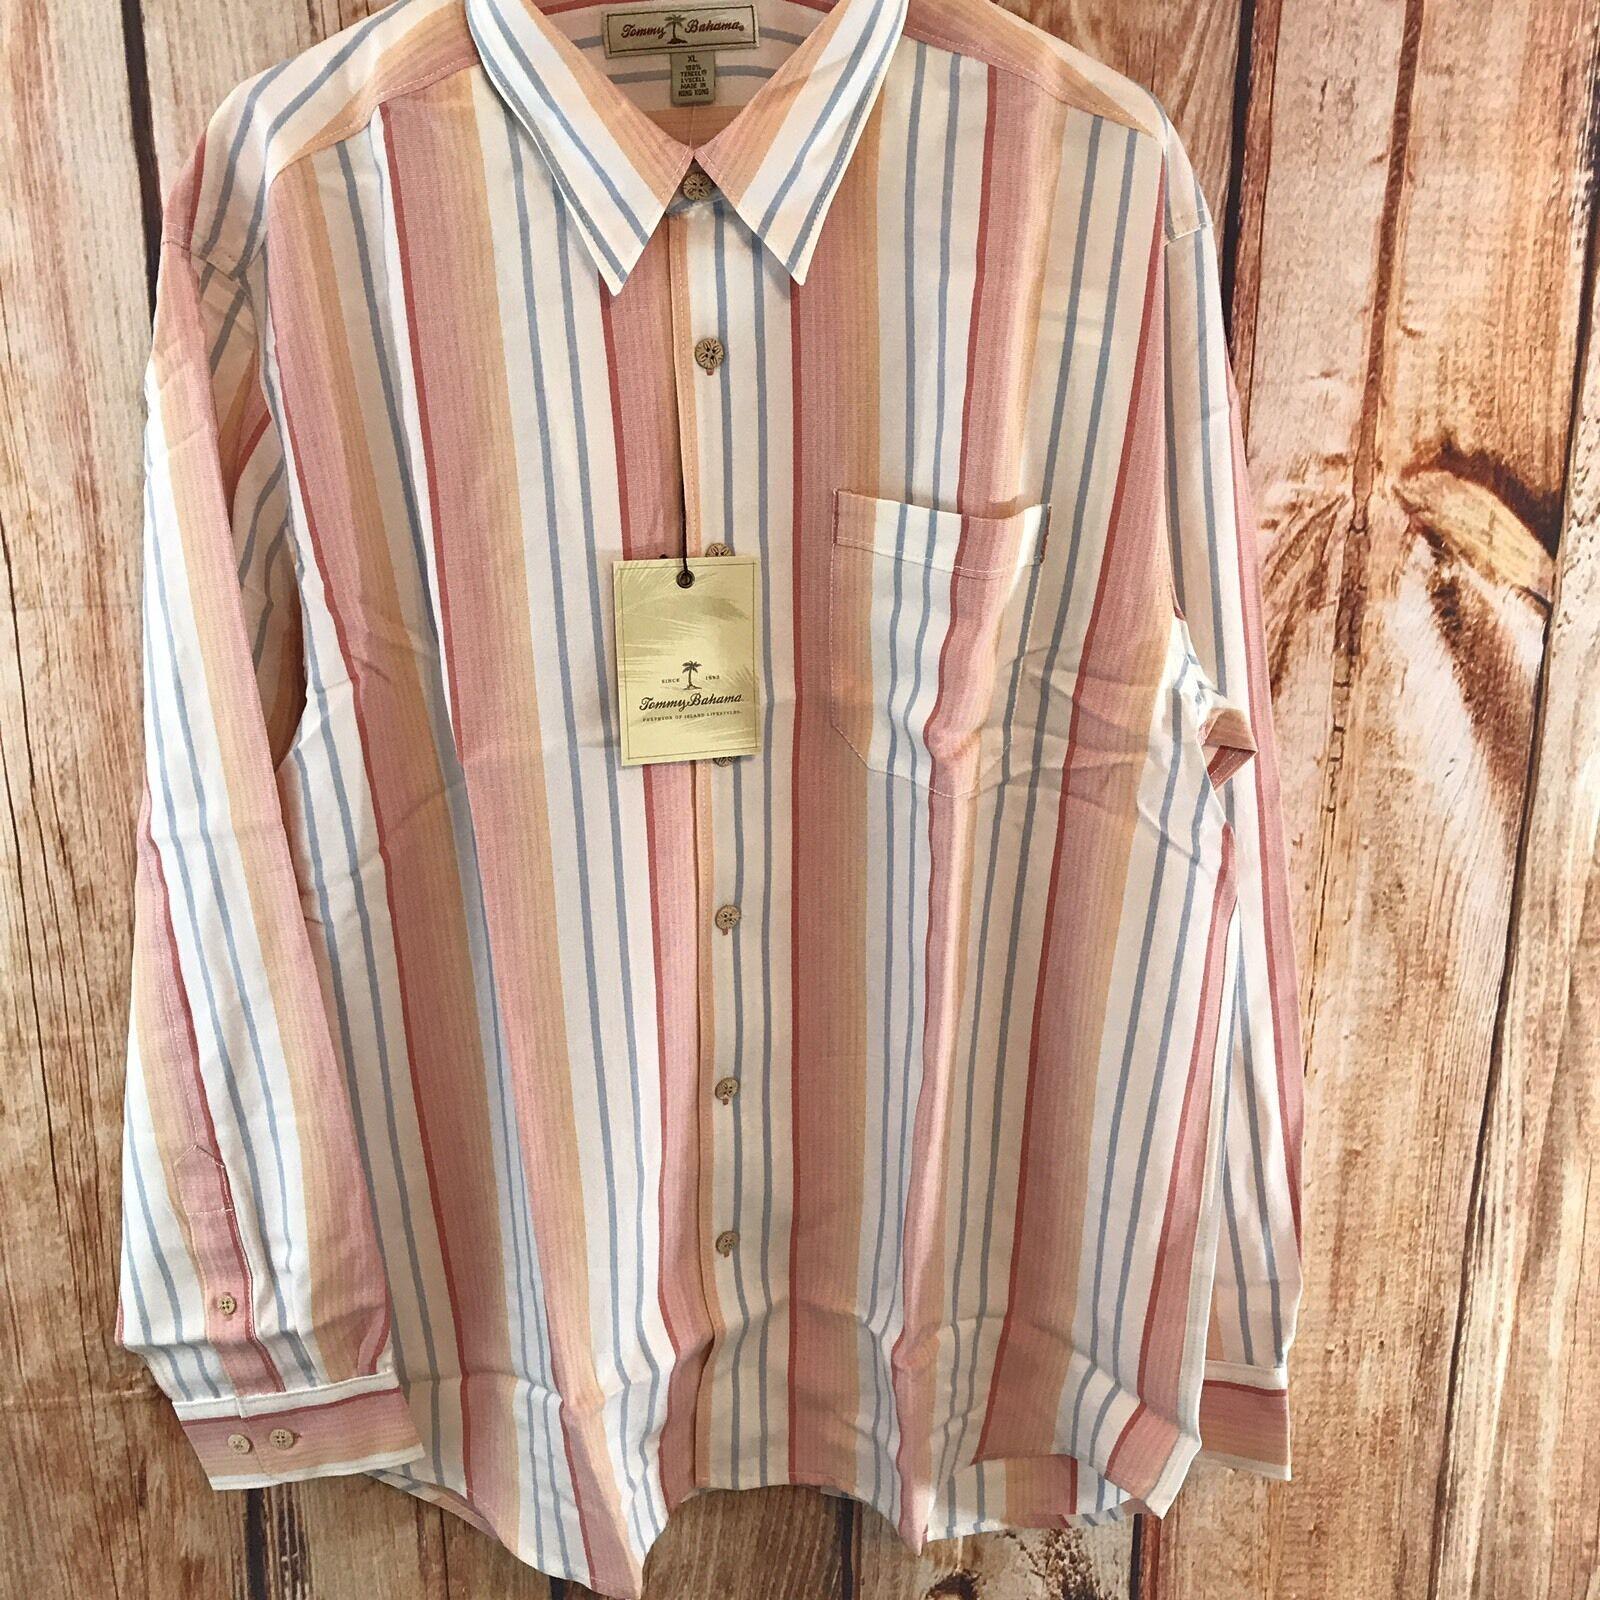 NWT Tommy Bahama Uomo's XL Kabuki Striped Button Down Shirt L2-11,  L2-11, Shirt 12 bf09c8